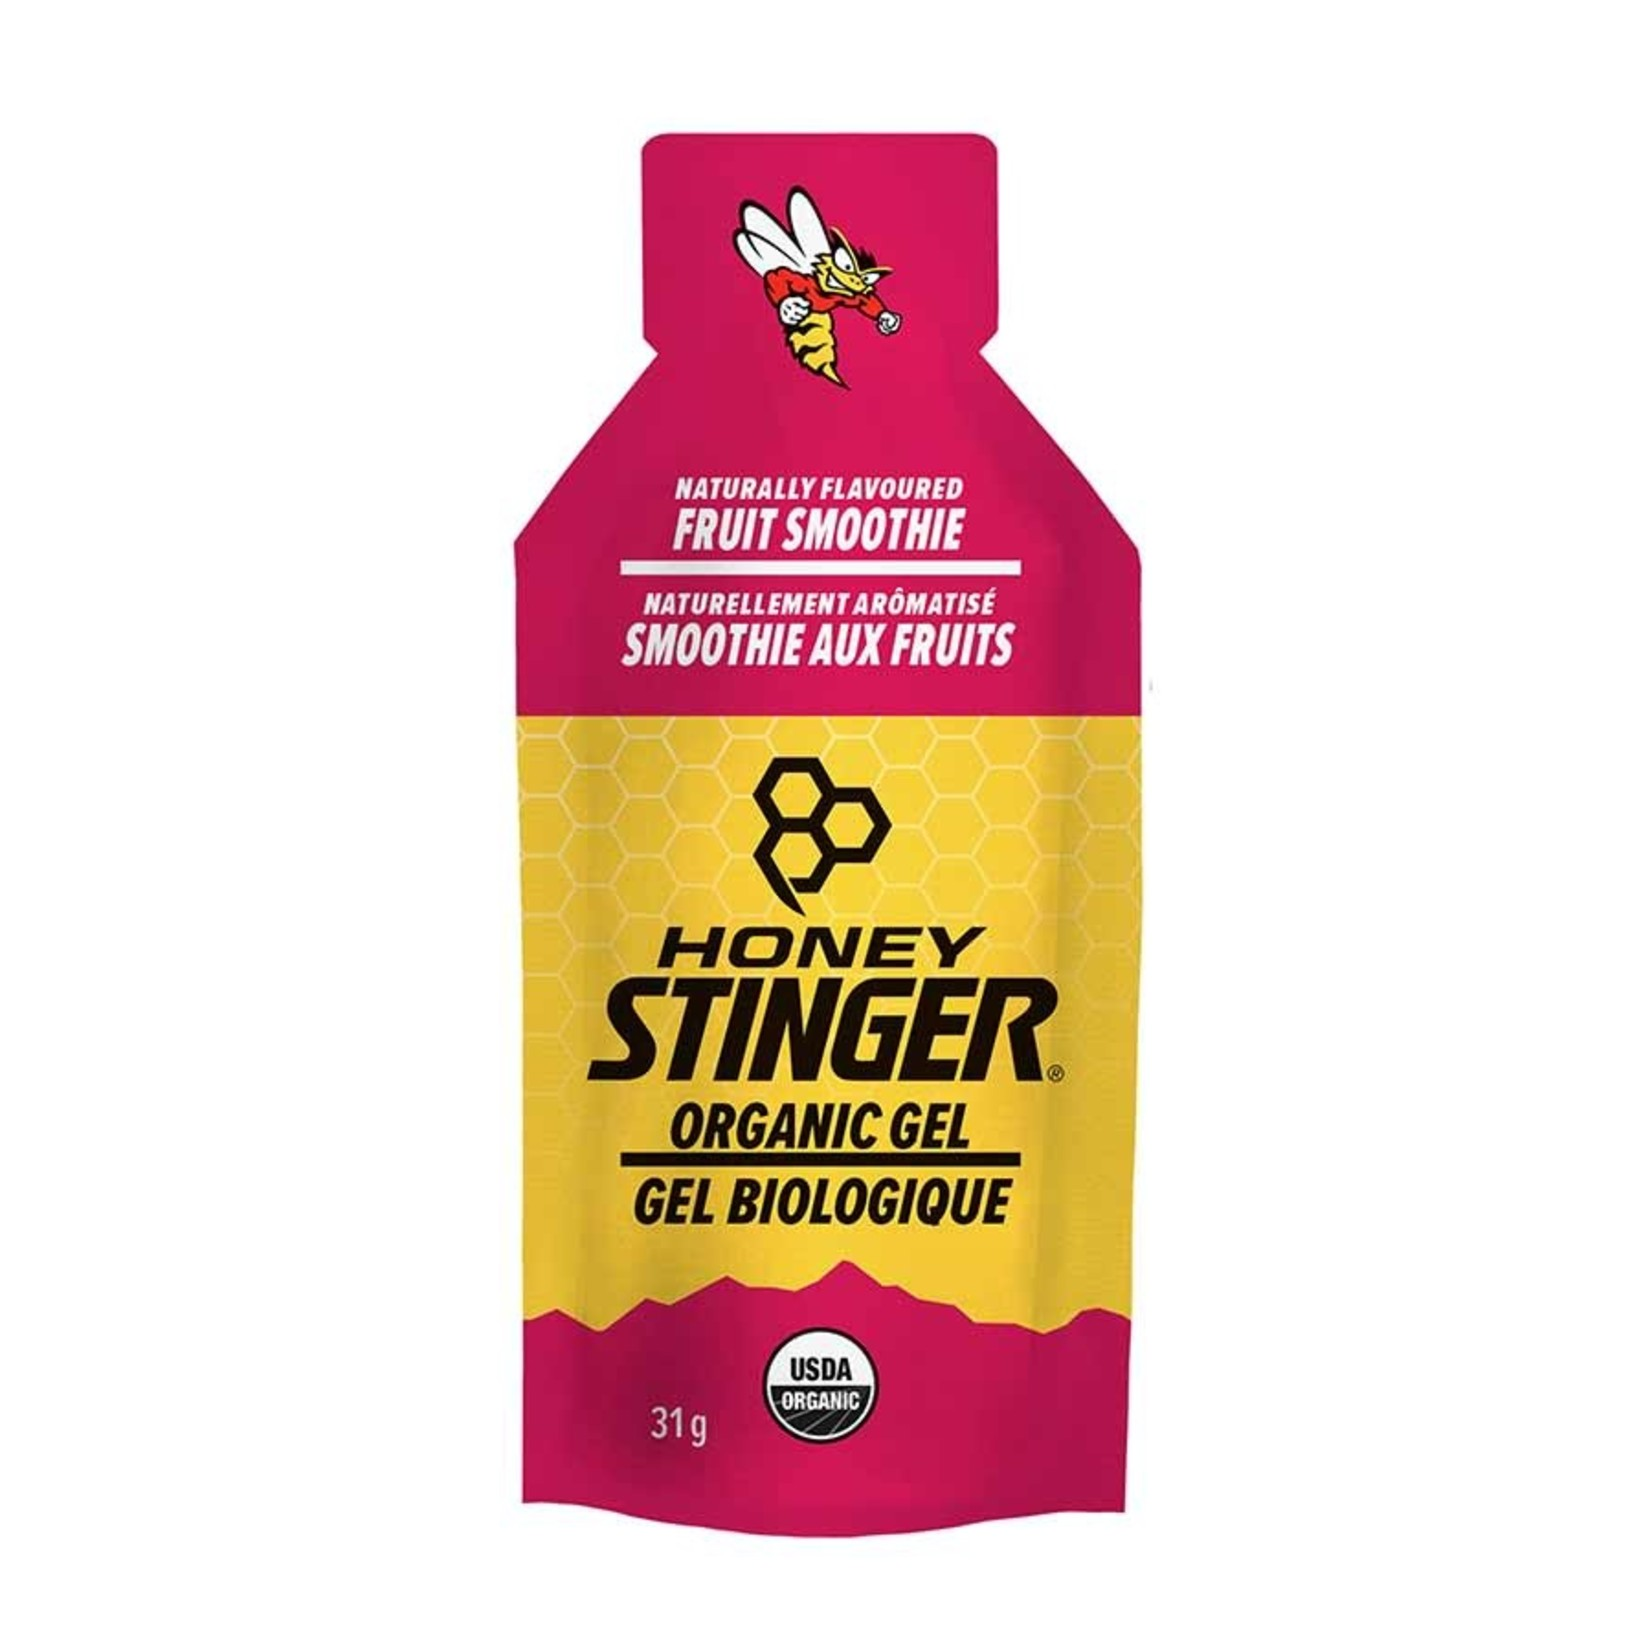 Honey Stinger Honey Stinger Gel Fruit Smoothie